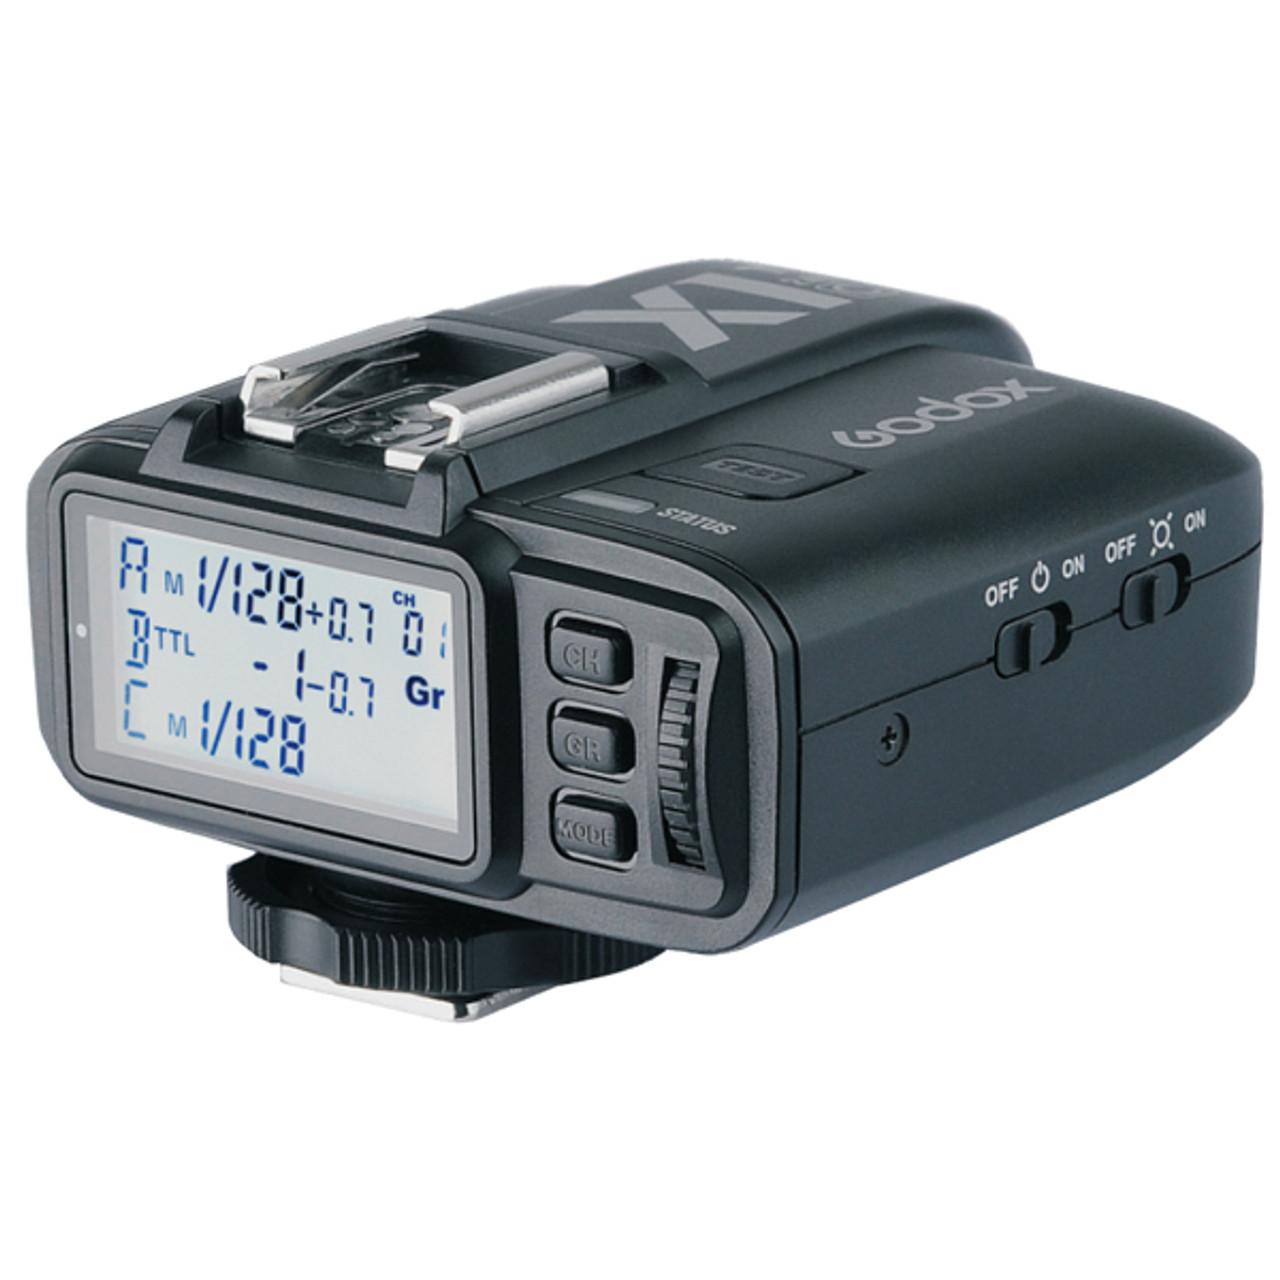 Godox X1T-N 2.4G Transmitter for Nikon